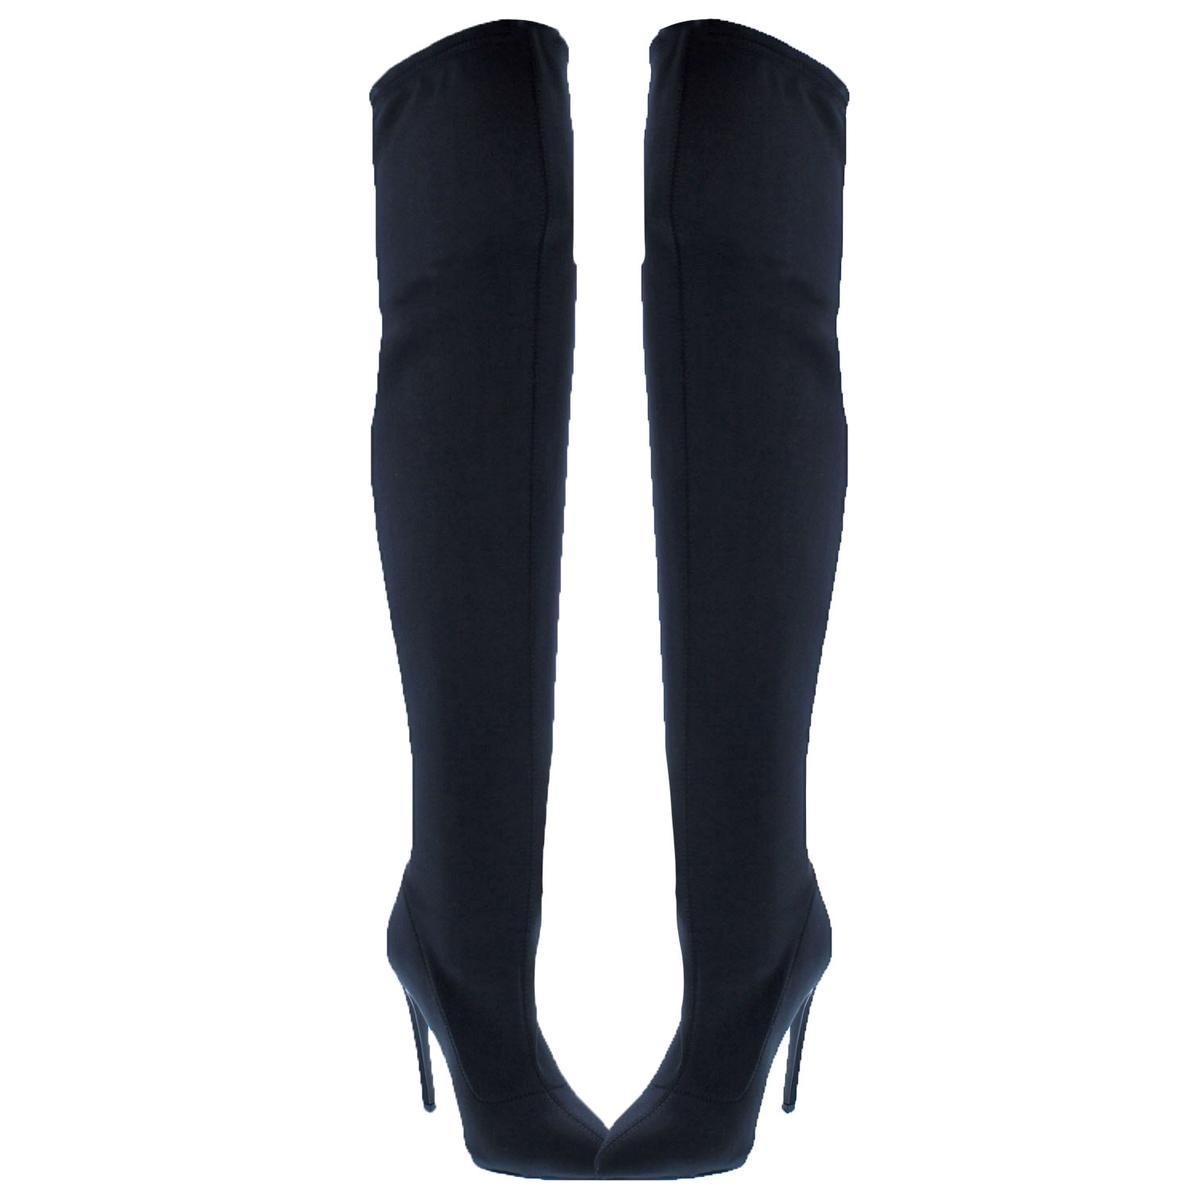 cdcdf04e945 Steve Madden Womens Slammin Black Over-The-Knee Boots 10 Medium (B